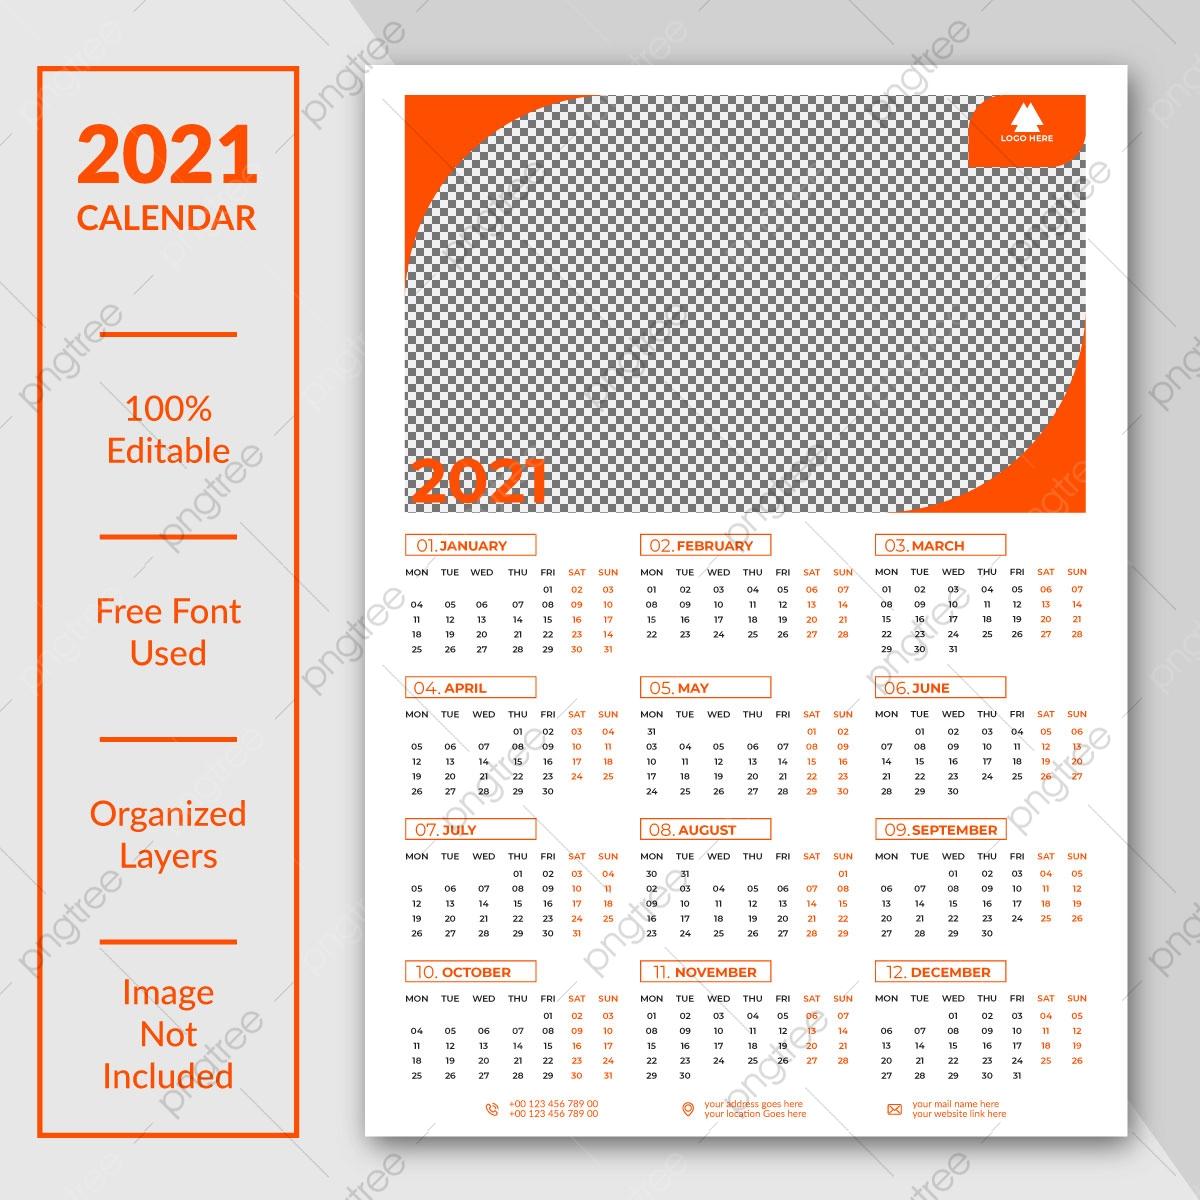 2021 Calendar Template Design Template Download On Pngtree